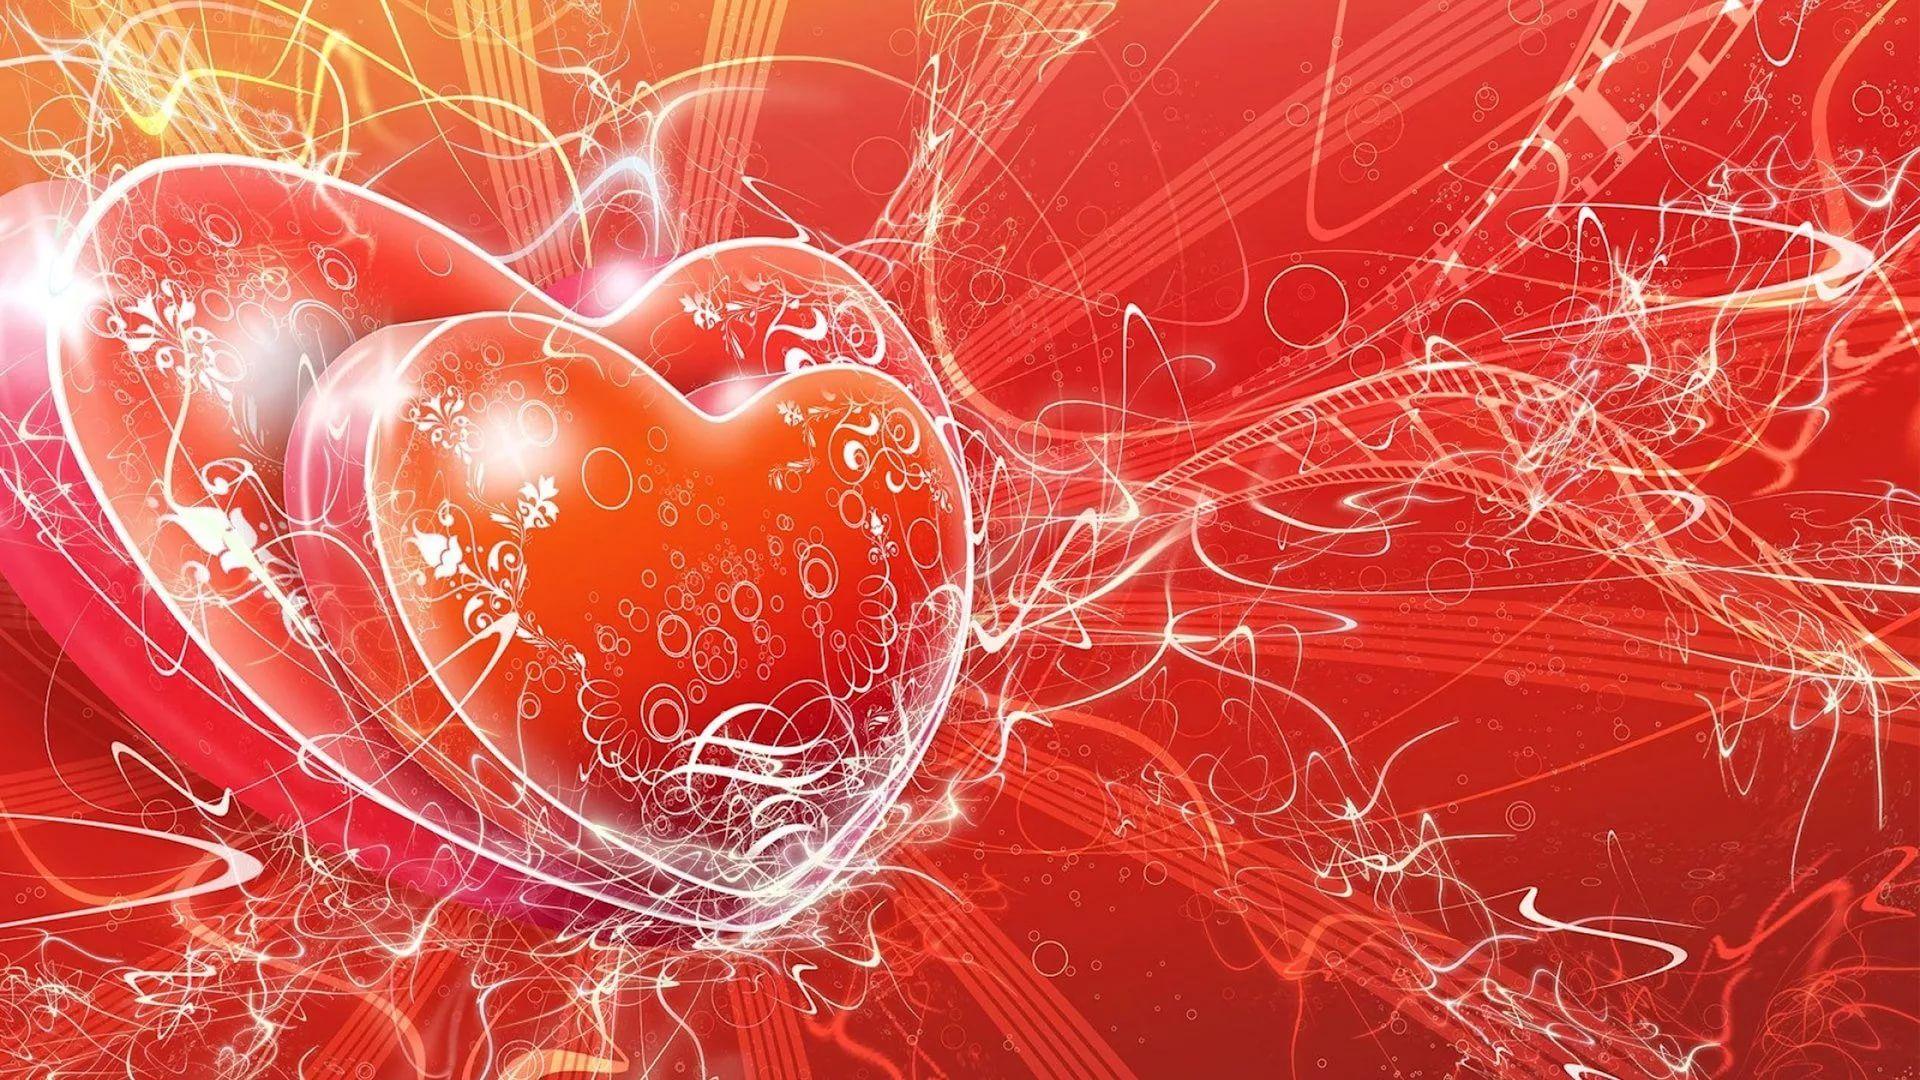 Valentine Screensaver download wallpaper image